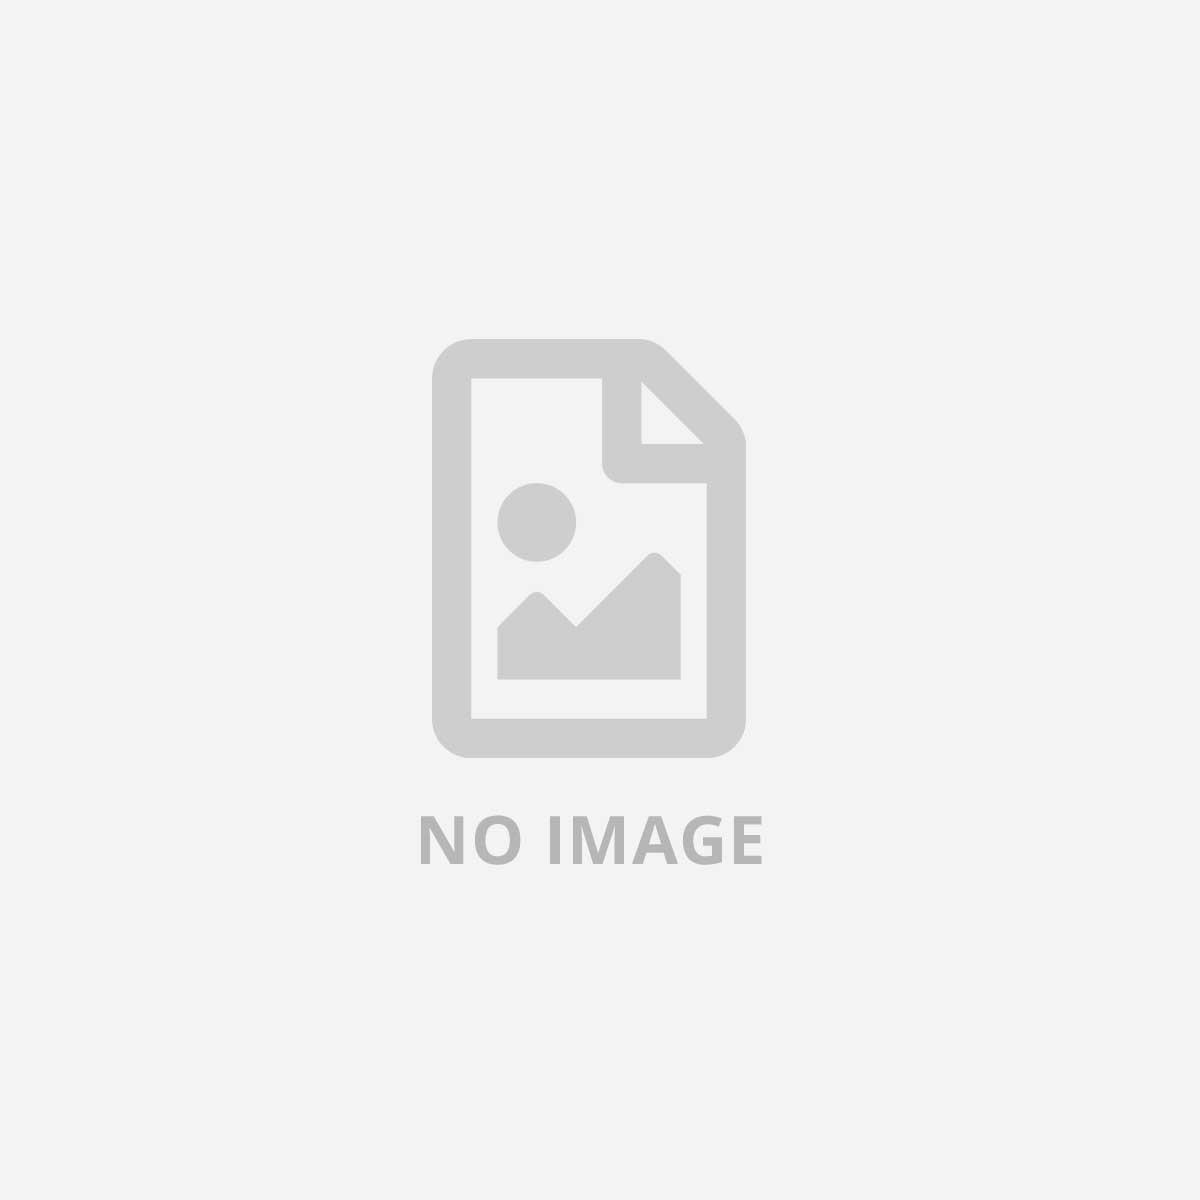 EPSON CARTA FOTOGRAFICA LUCIDA A3 20 FG